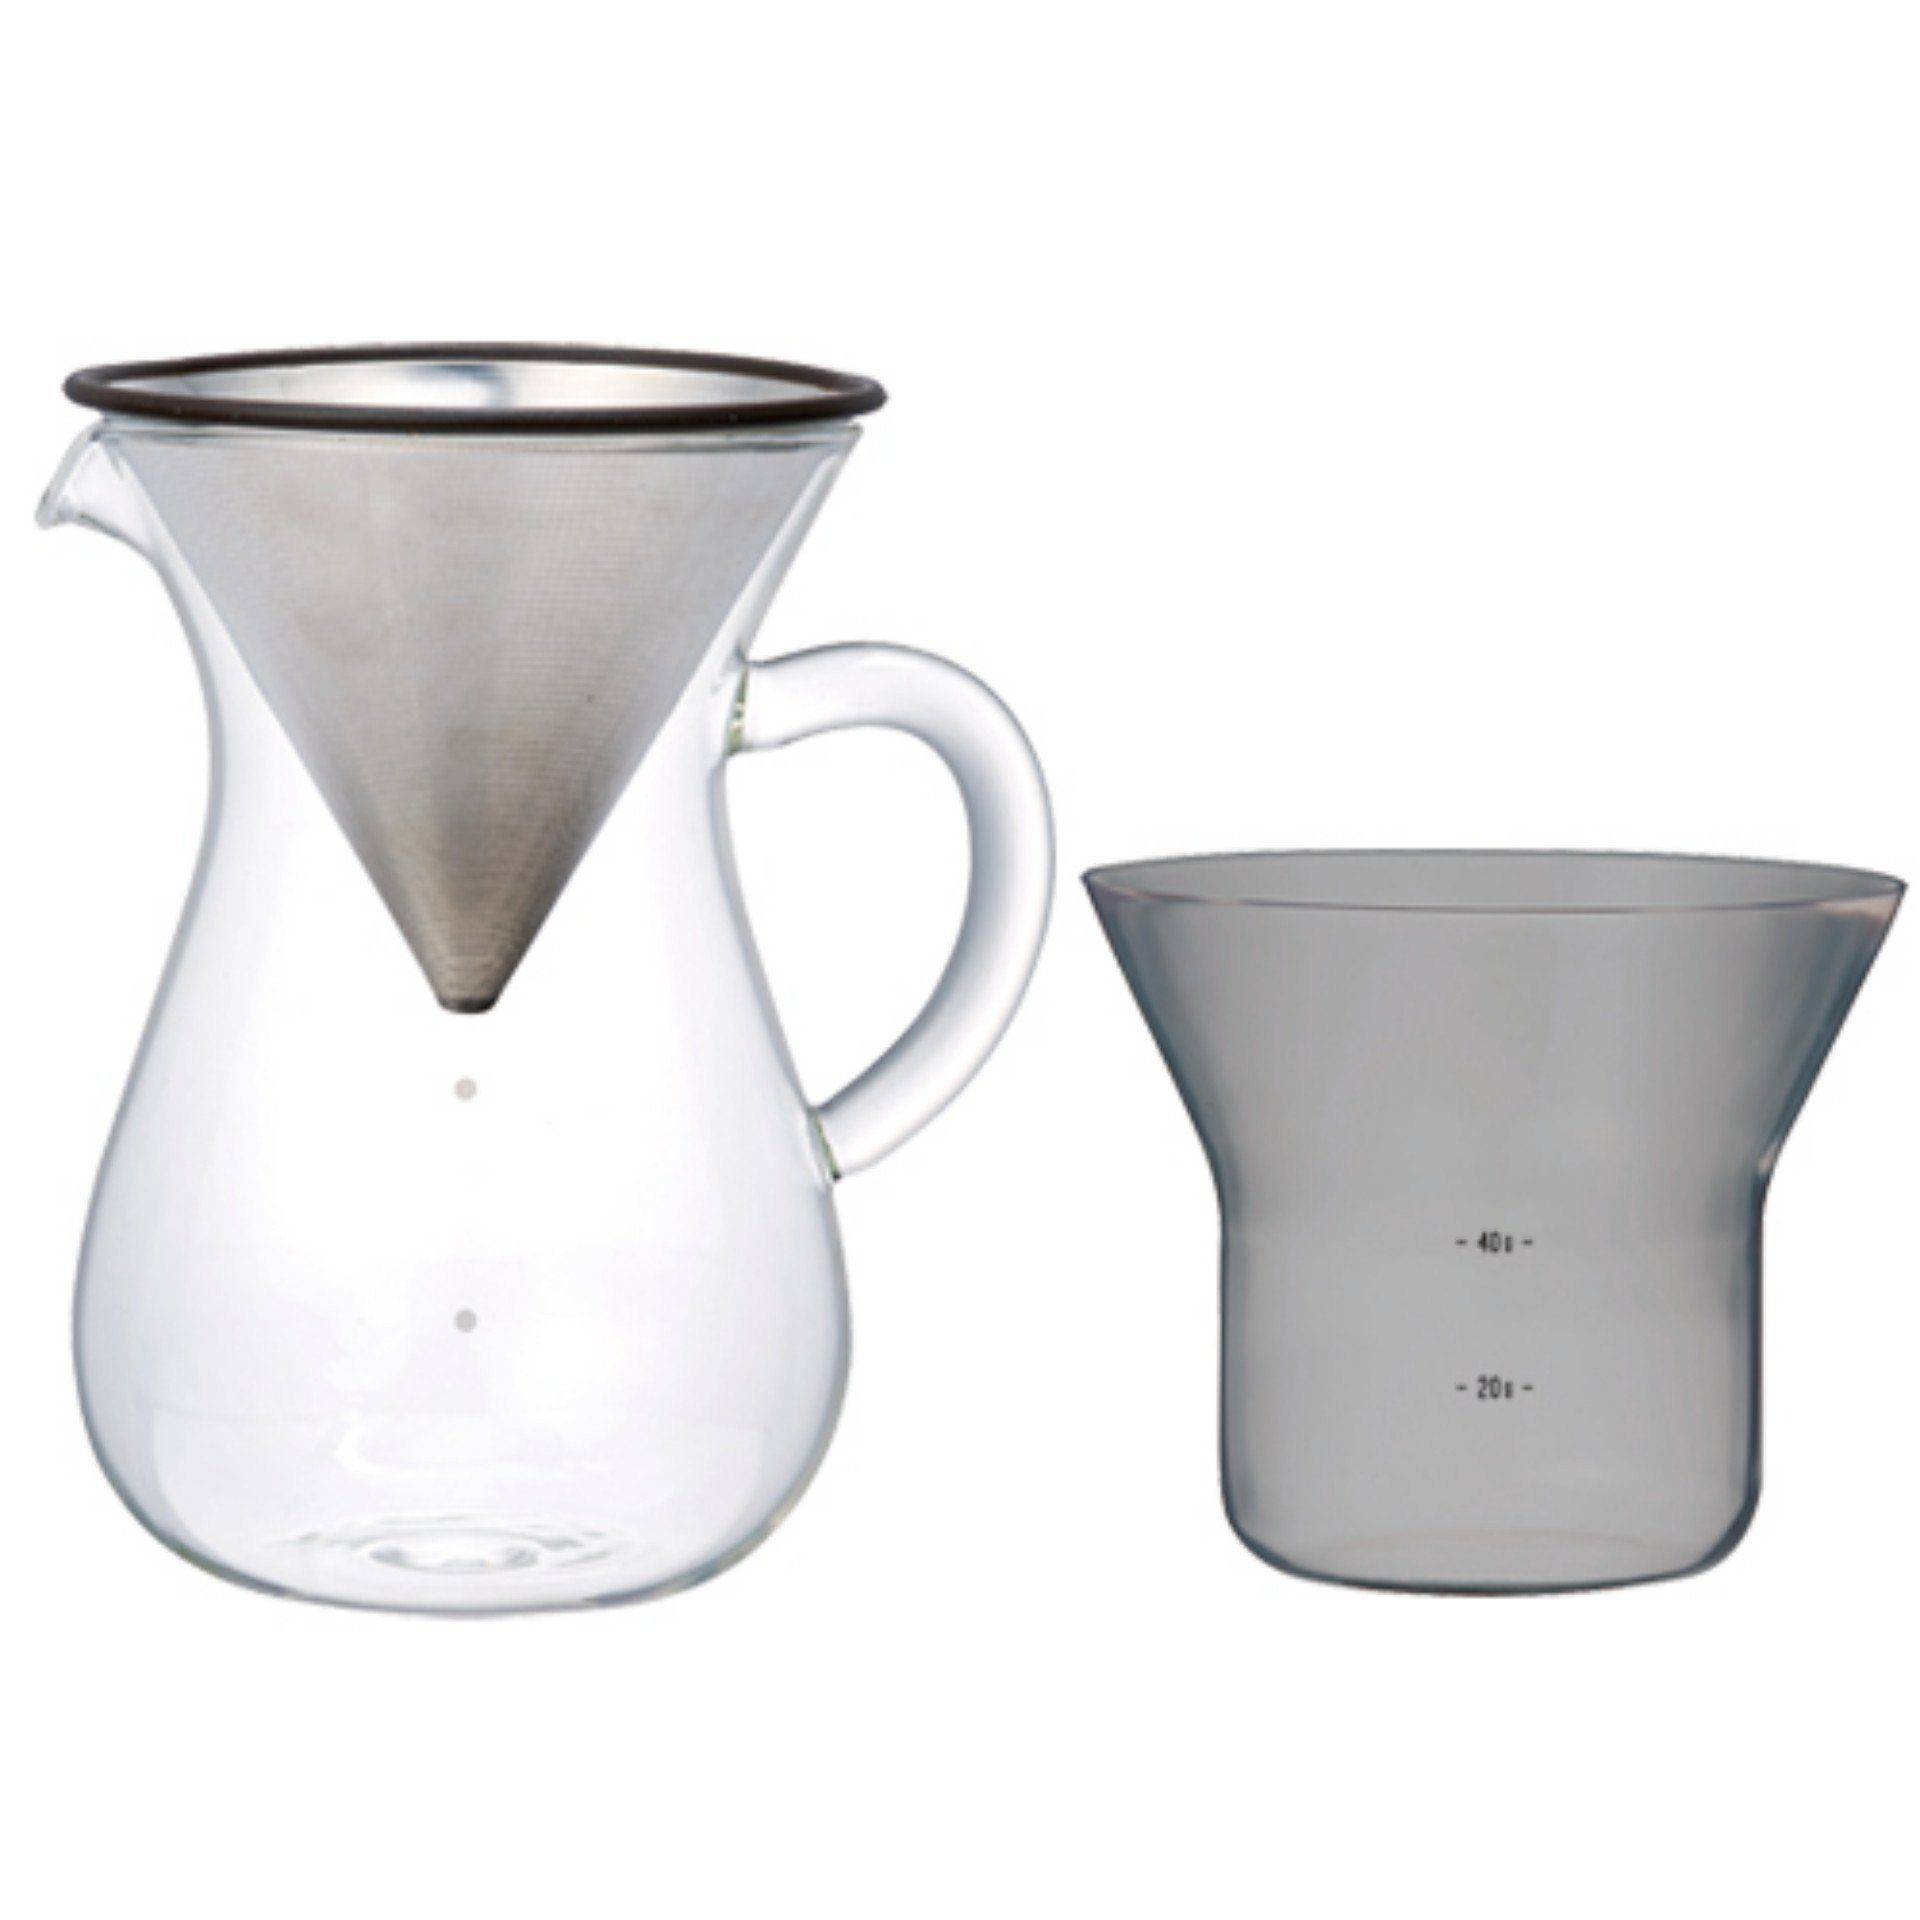 Kaffeefilter Edelstahl kinto coffee style kaffeekaraffe set mit kaffeefilter